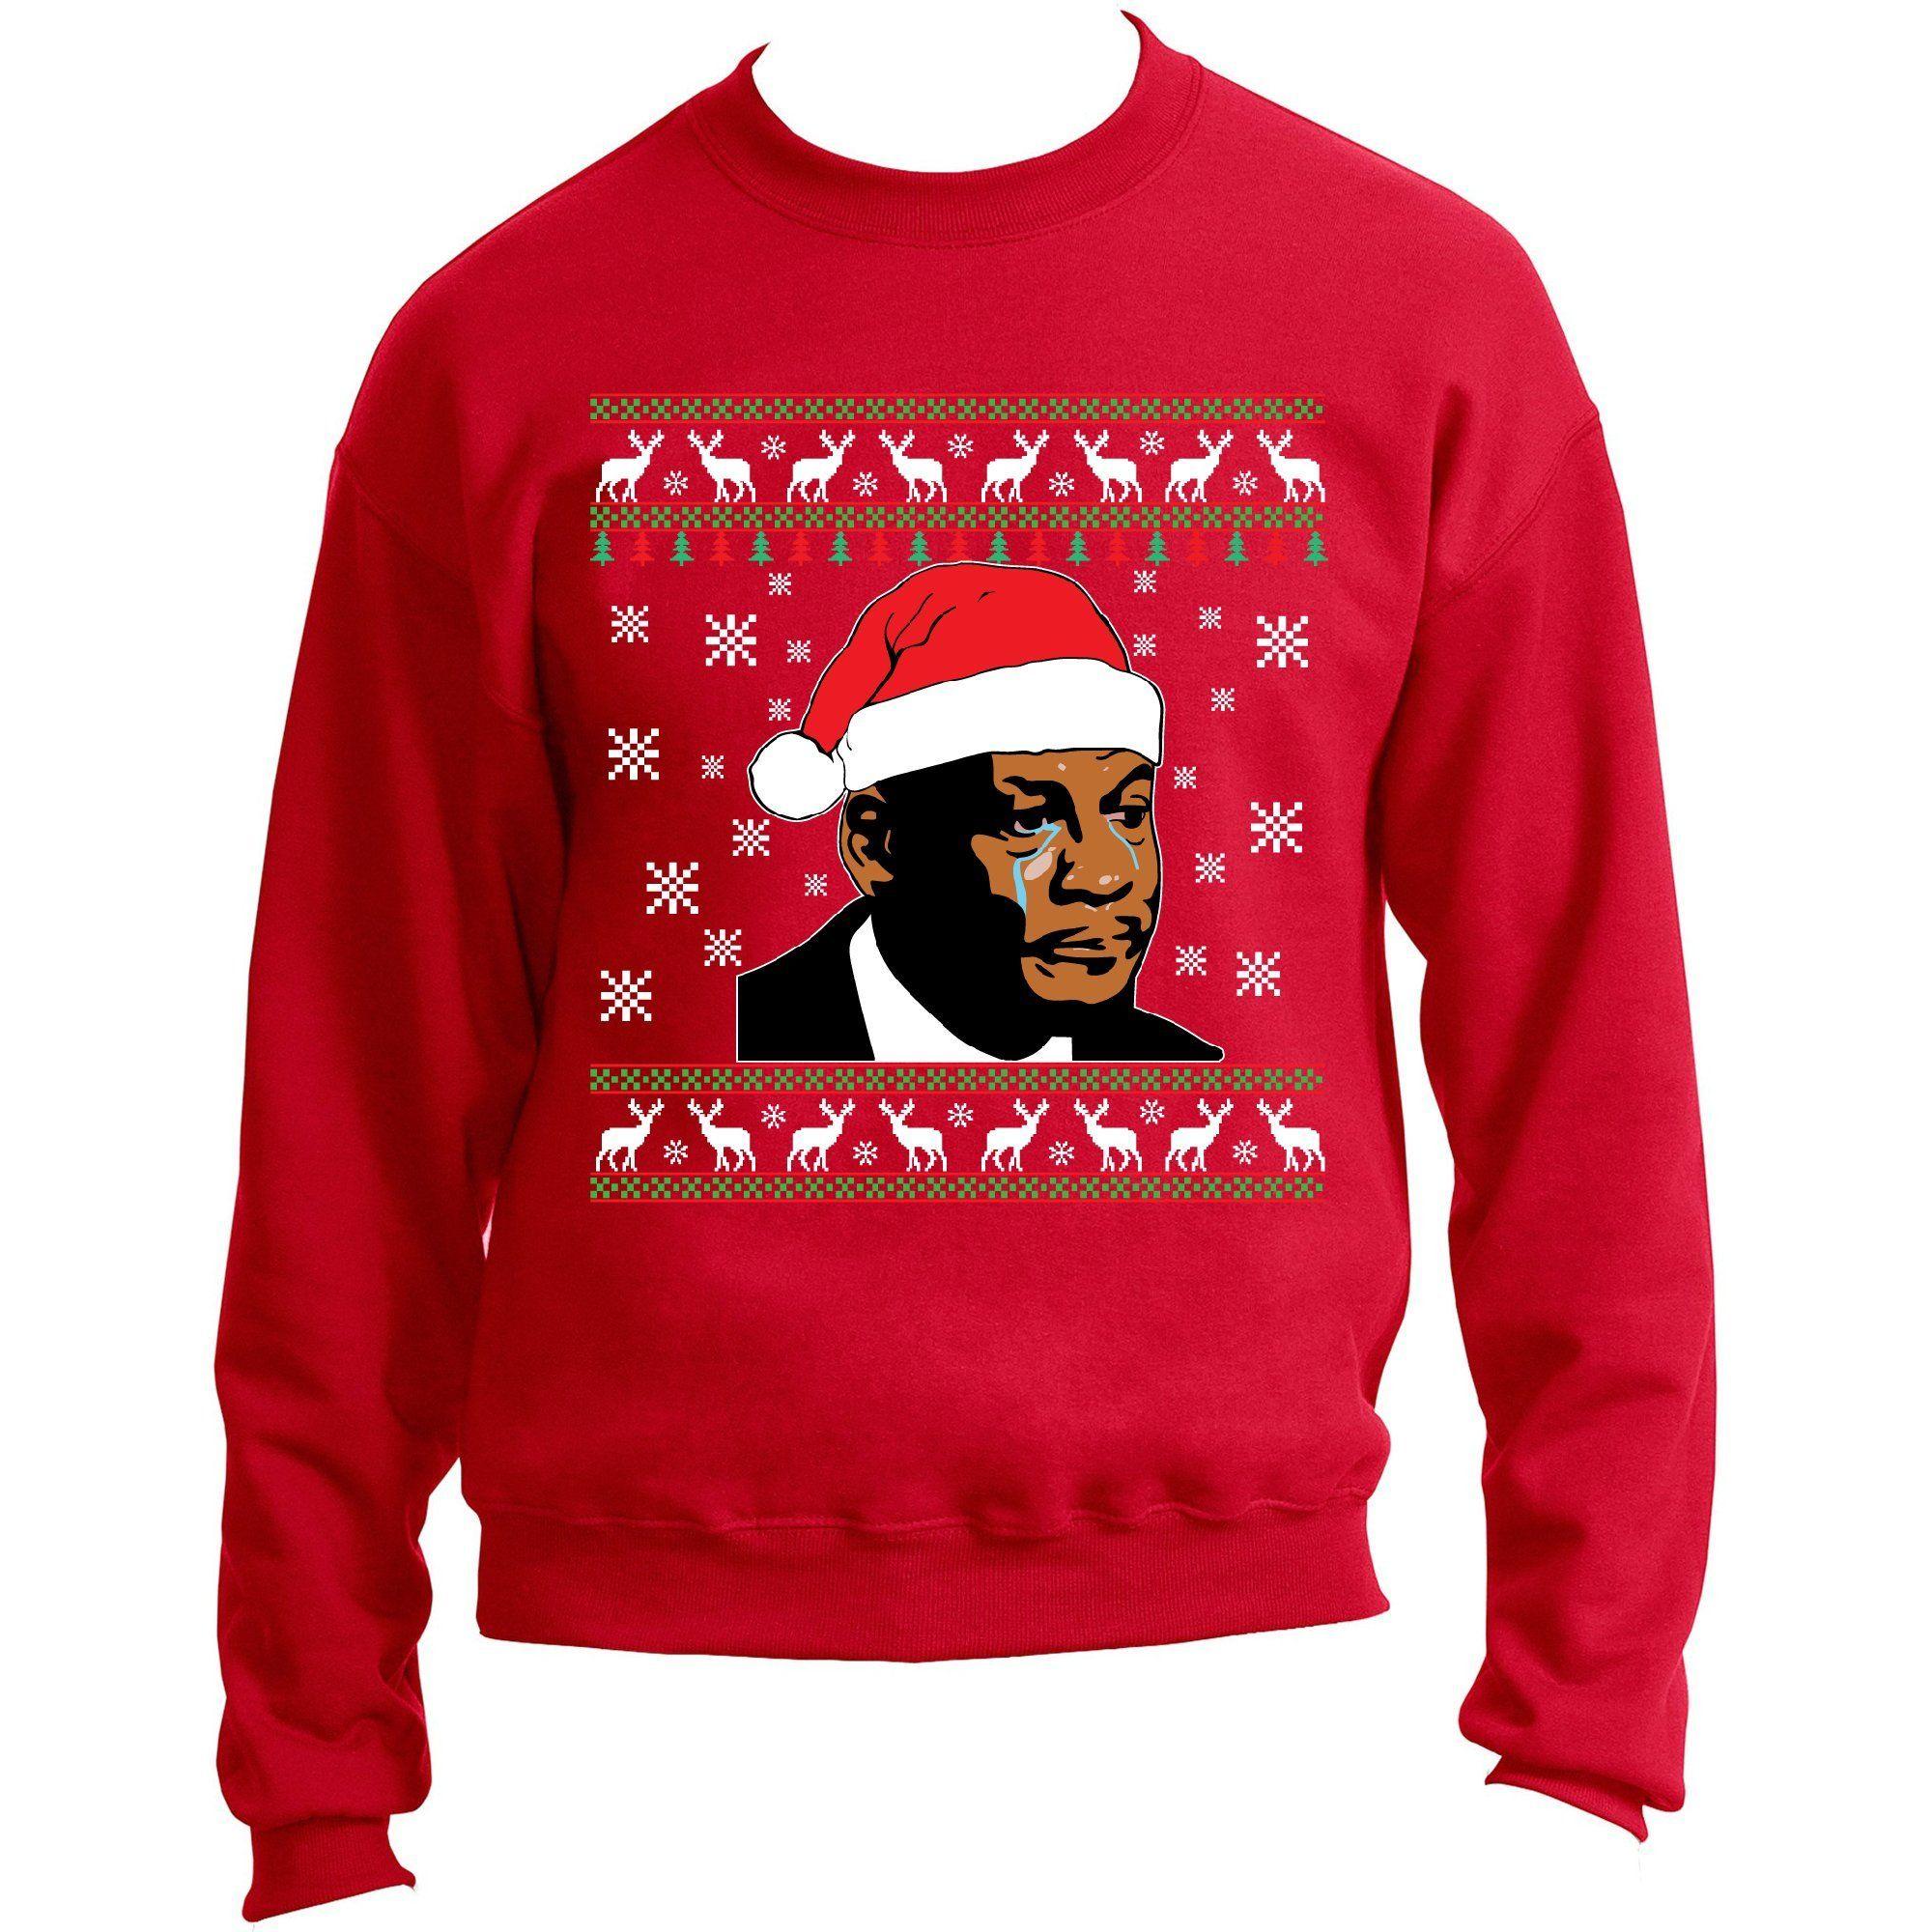 8eb3cdcab0ba5b Crying Jordan Meme Sneakerhead Red Ugly Christmas Sweater